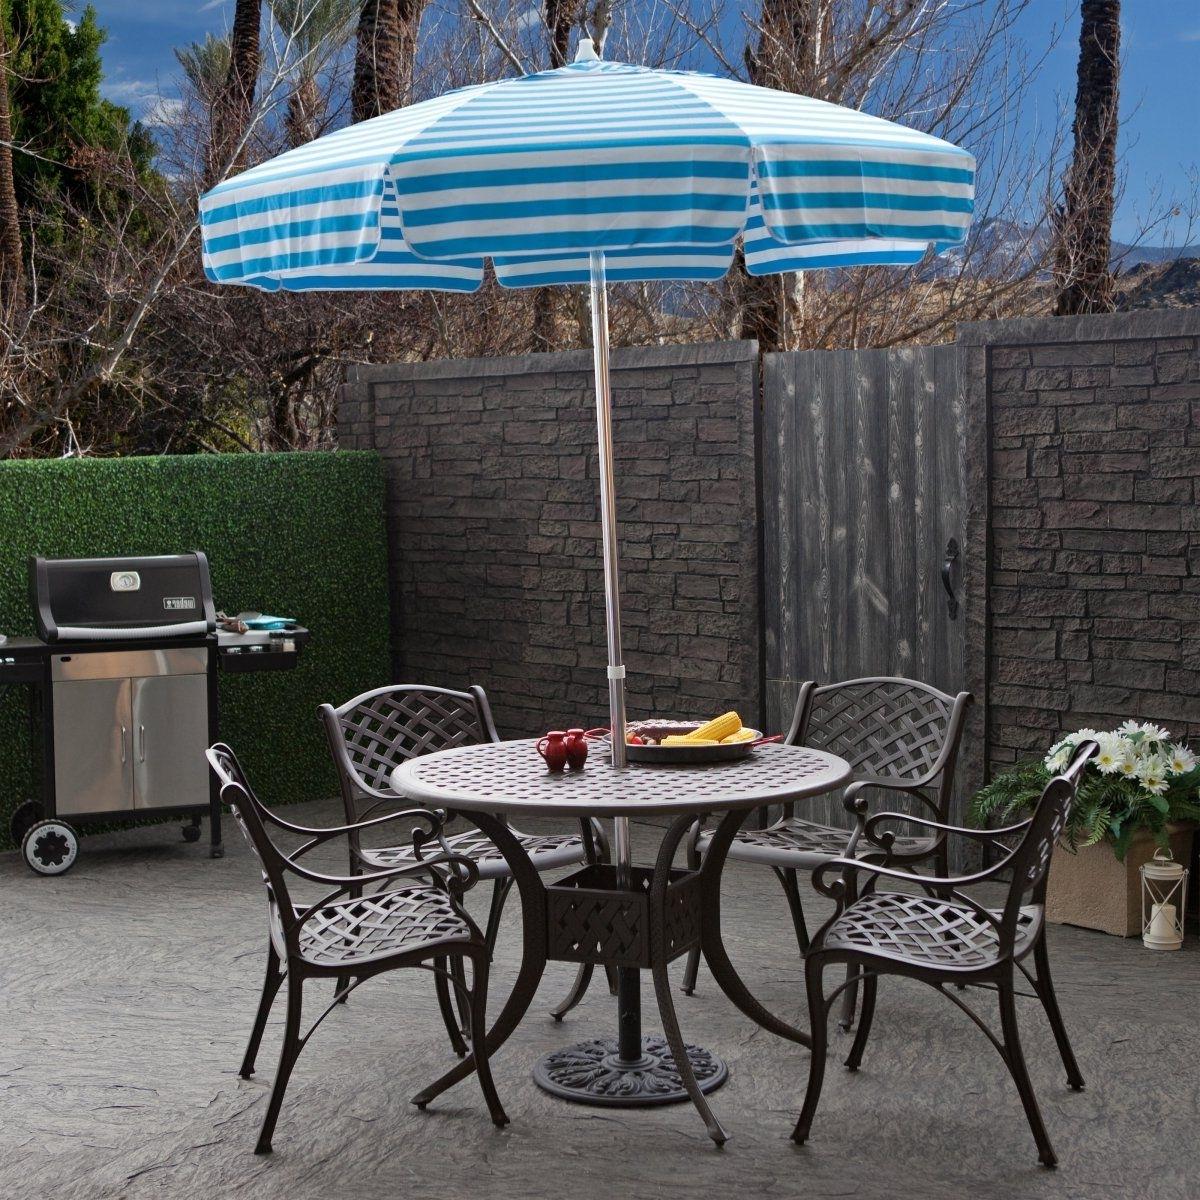 Patio Tables With Umbrellas Pertaining To Popular Wicker Lane Offers Patio Umbrellas, Patio Market Umbrellas, Market (View 4 of 20)